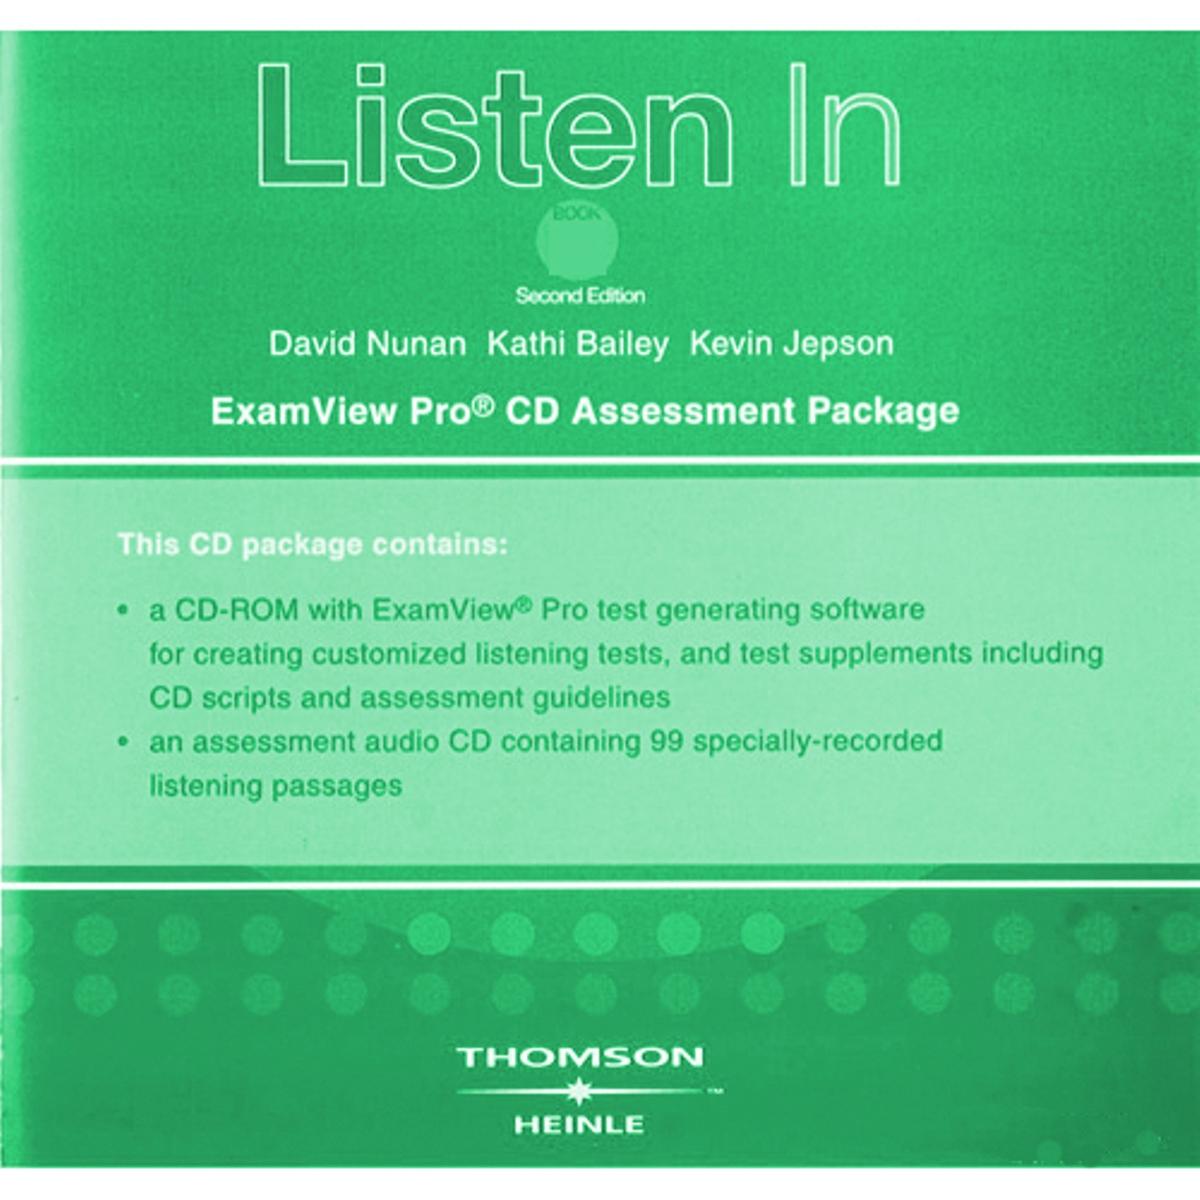 Listen In Book 3 ExamView CD-ROM(x1)